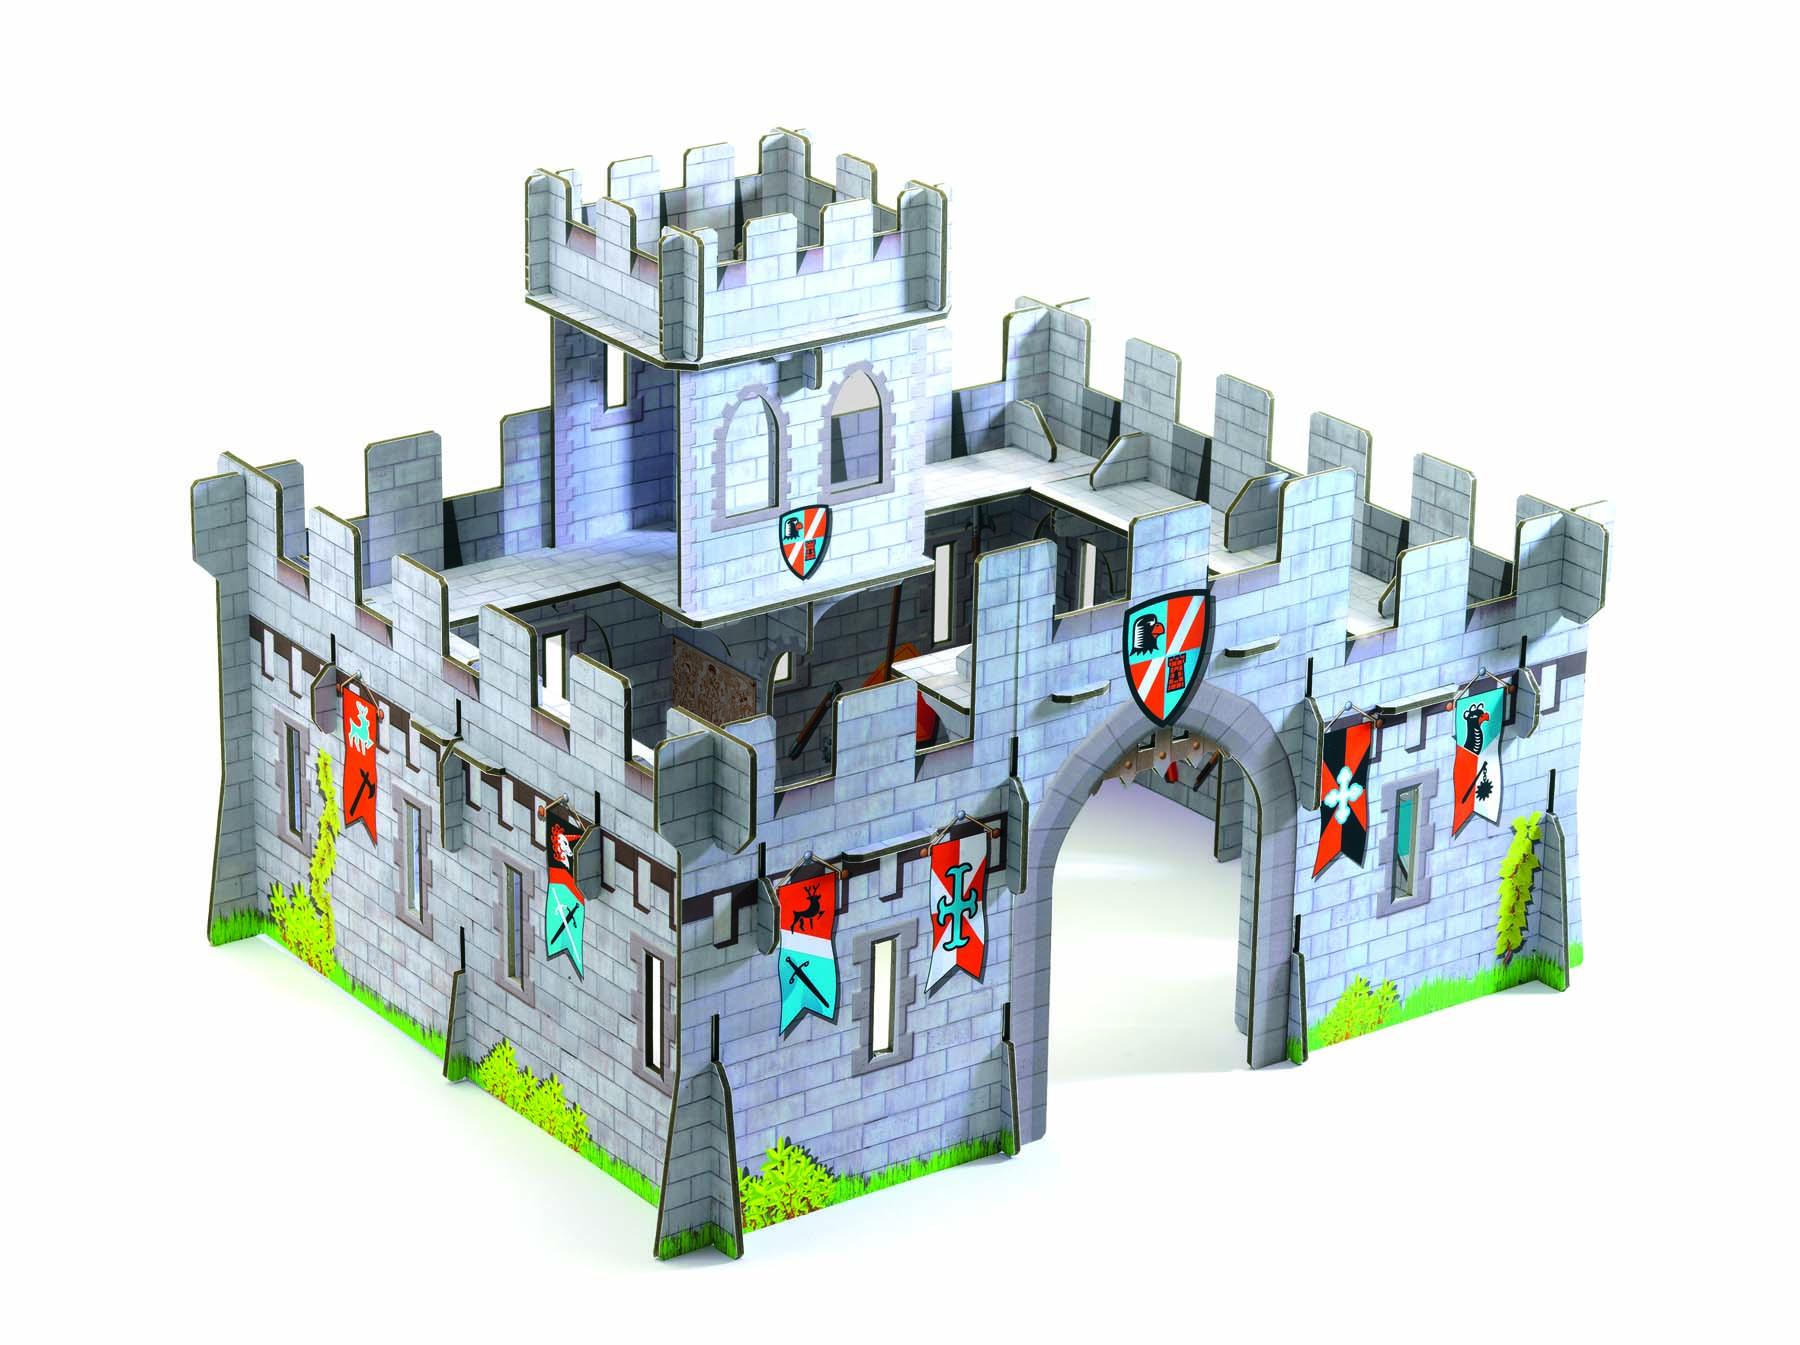 Castel medieval macheta 3d djeco imagine